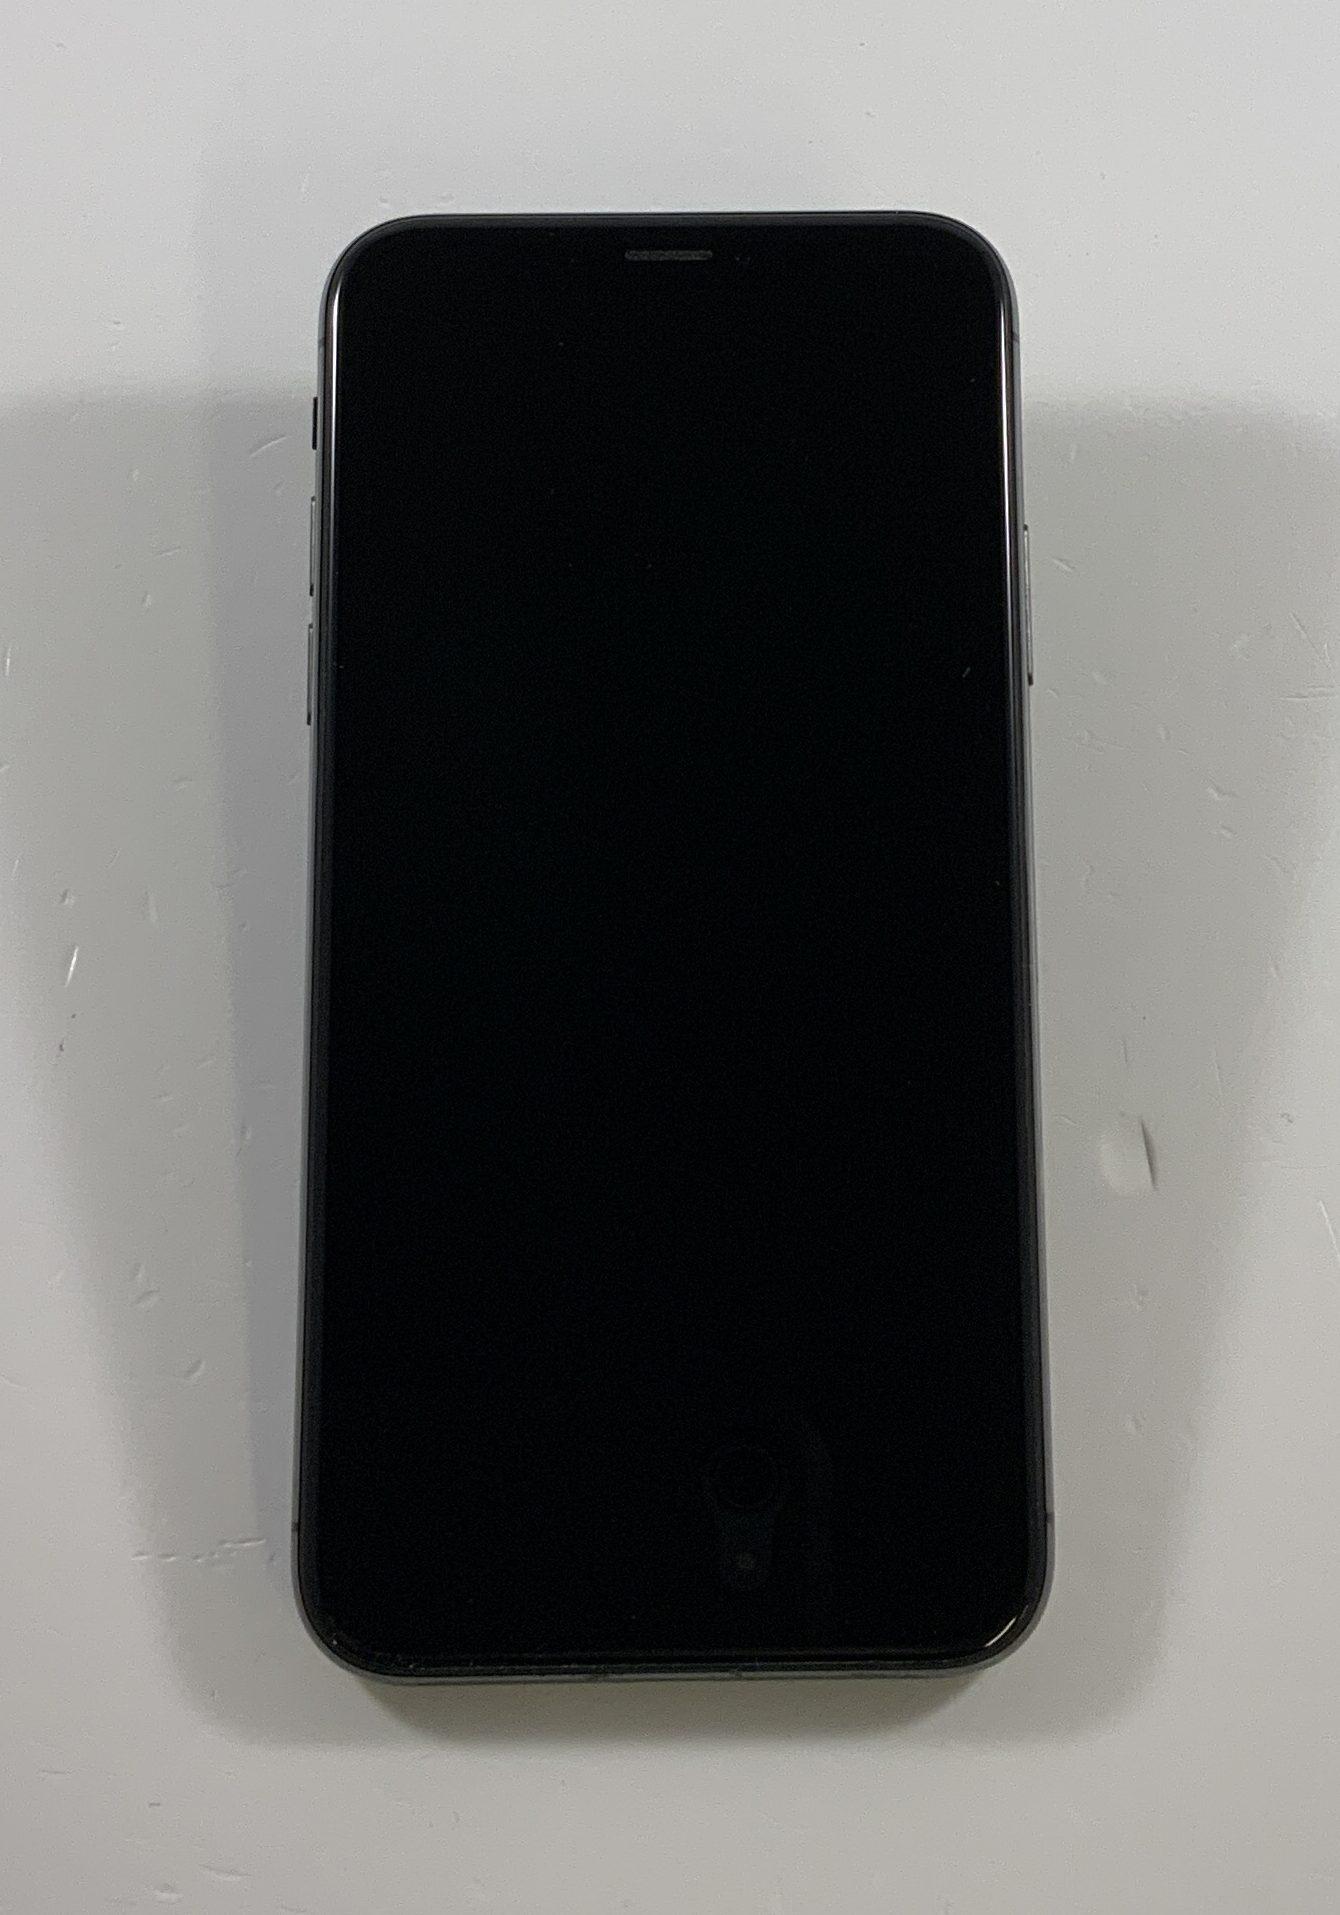 iPhone X 64GB, 64GB, Space Gray, immagine 1